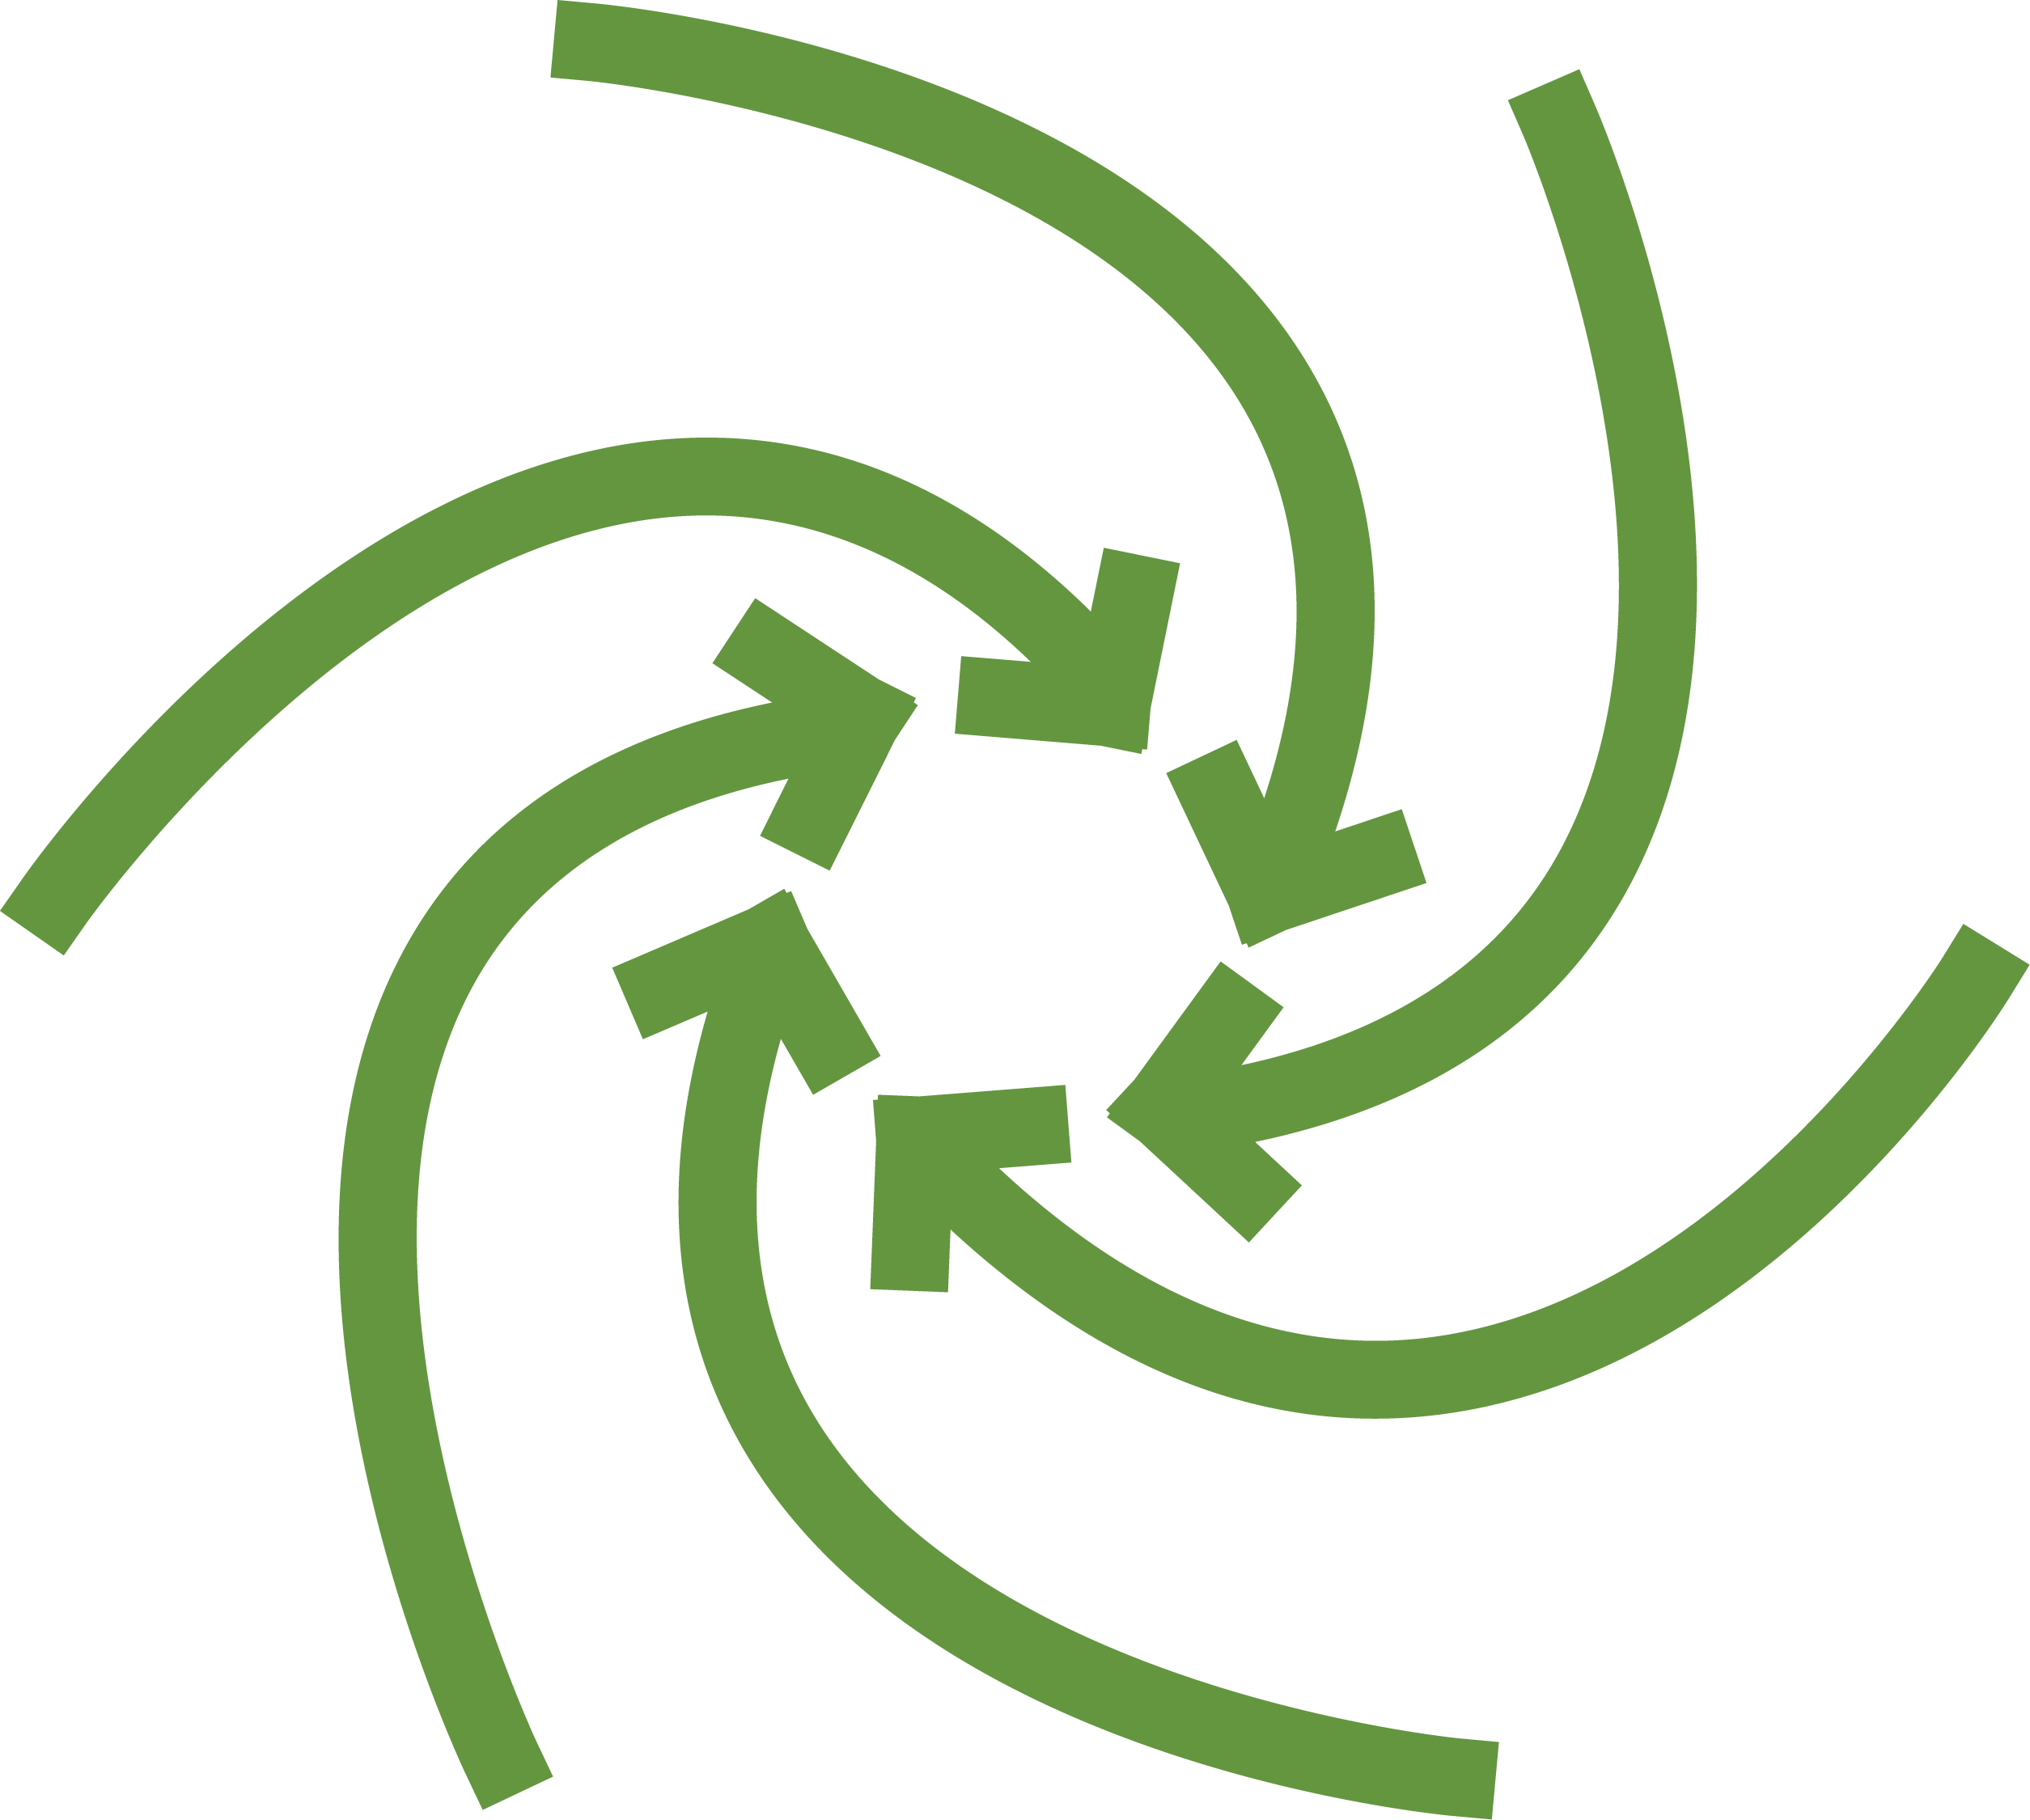 circlular inward facing green arrows